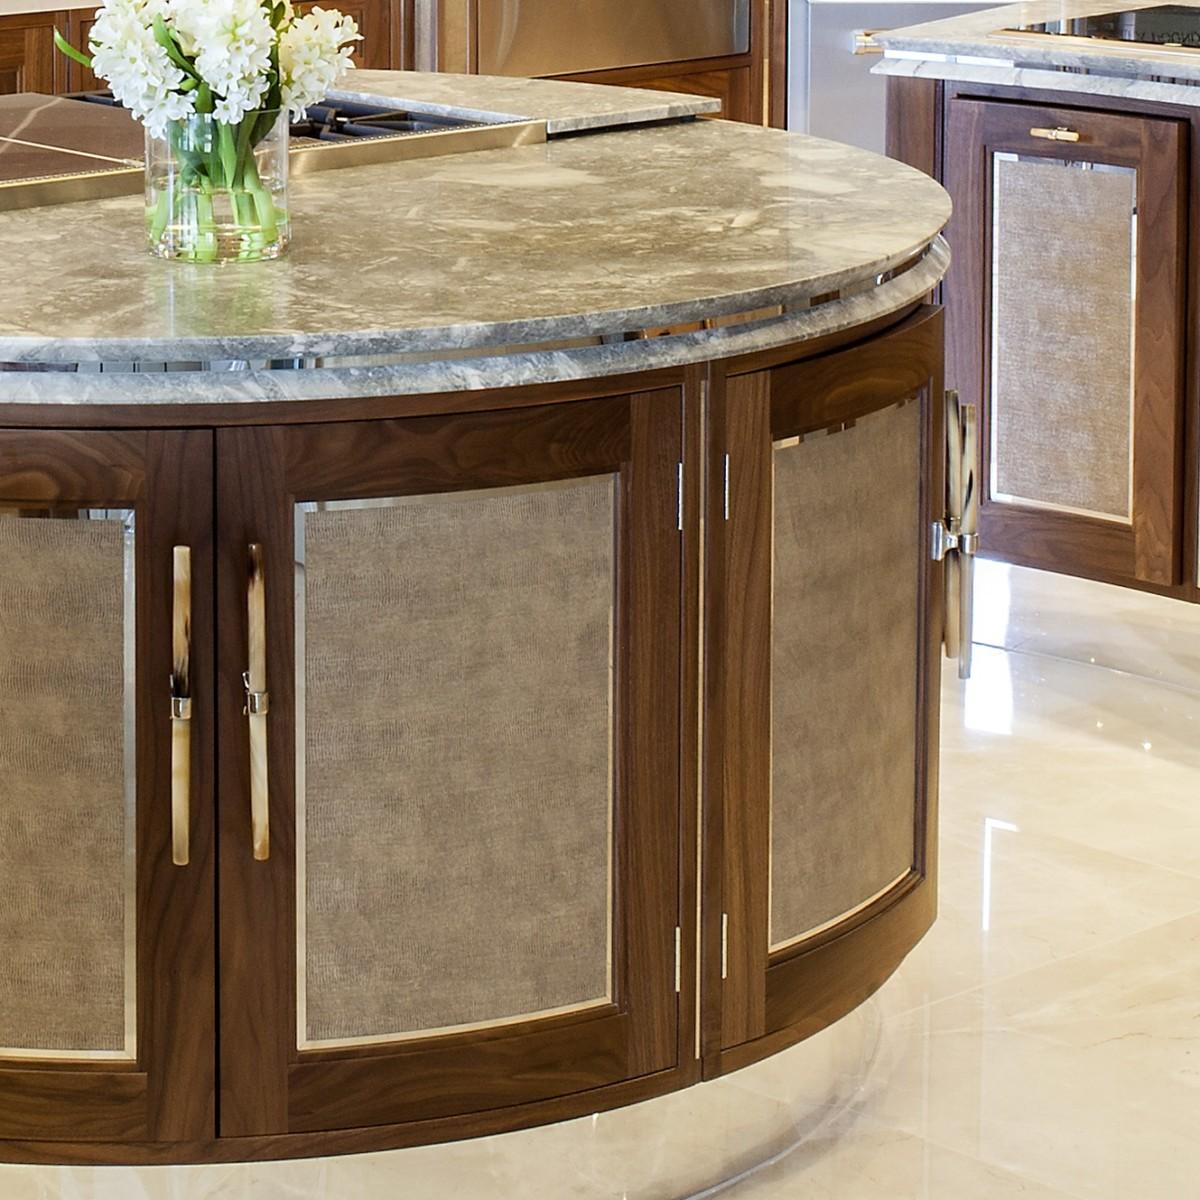 Kitchen Worktops York Uk: Granite & Quartz Kitchen Worktops